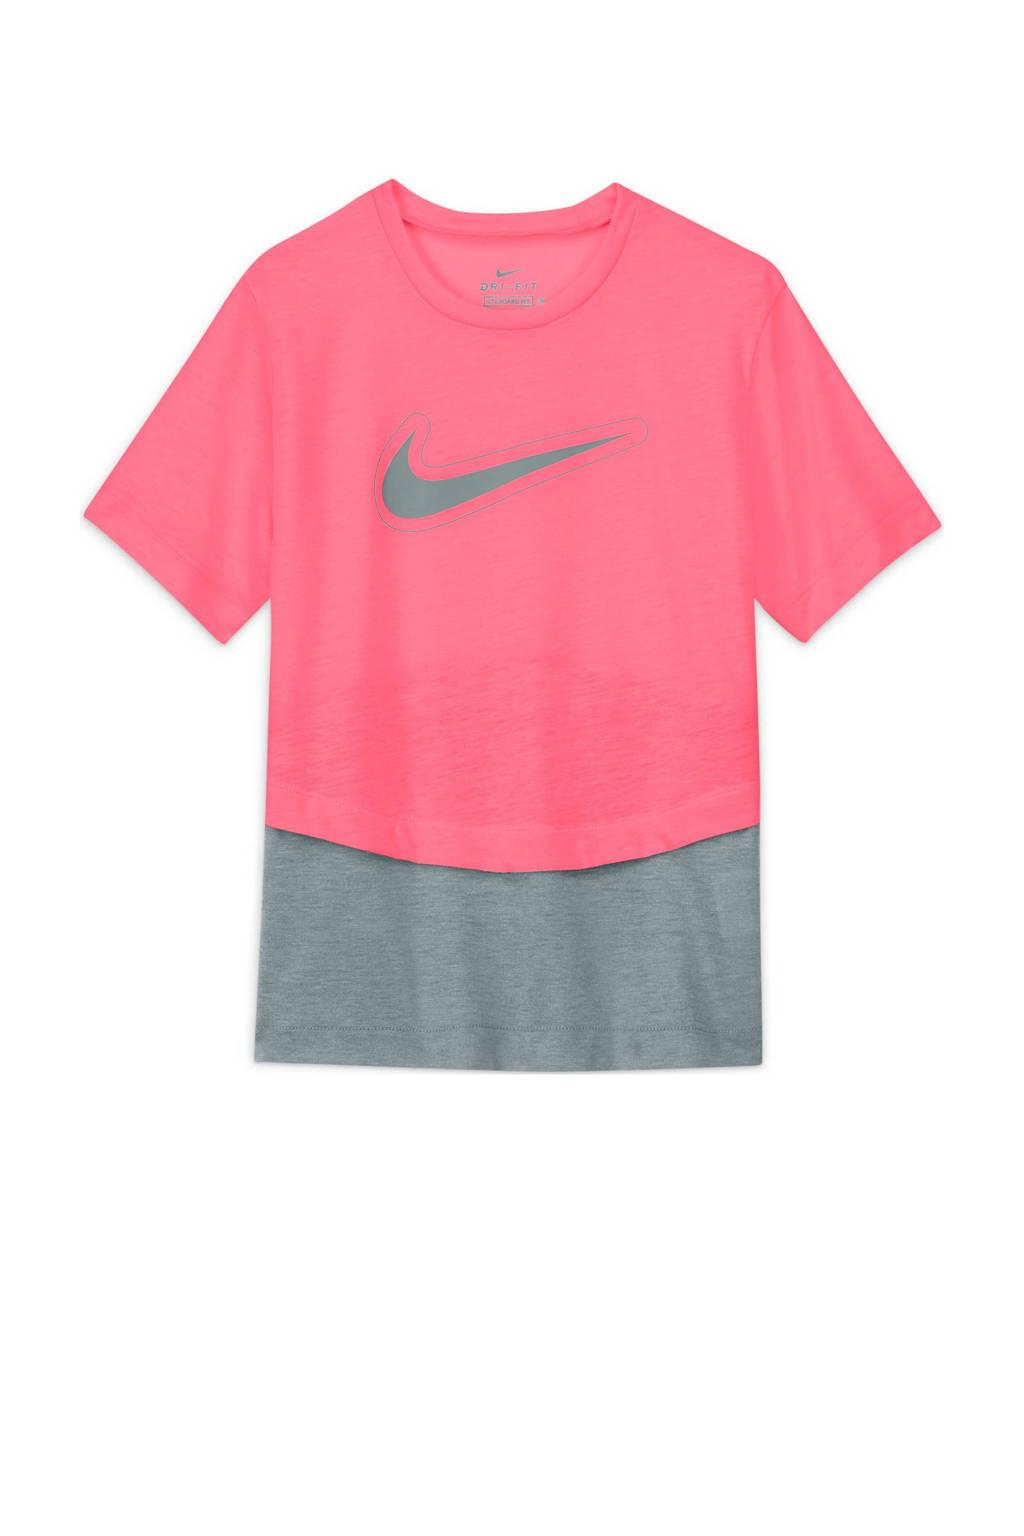 Nike T-shirt roze/grijs, Roze/grijs